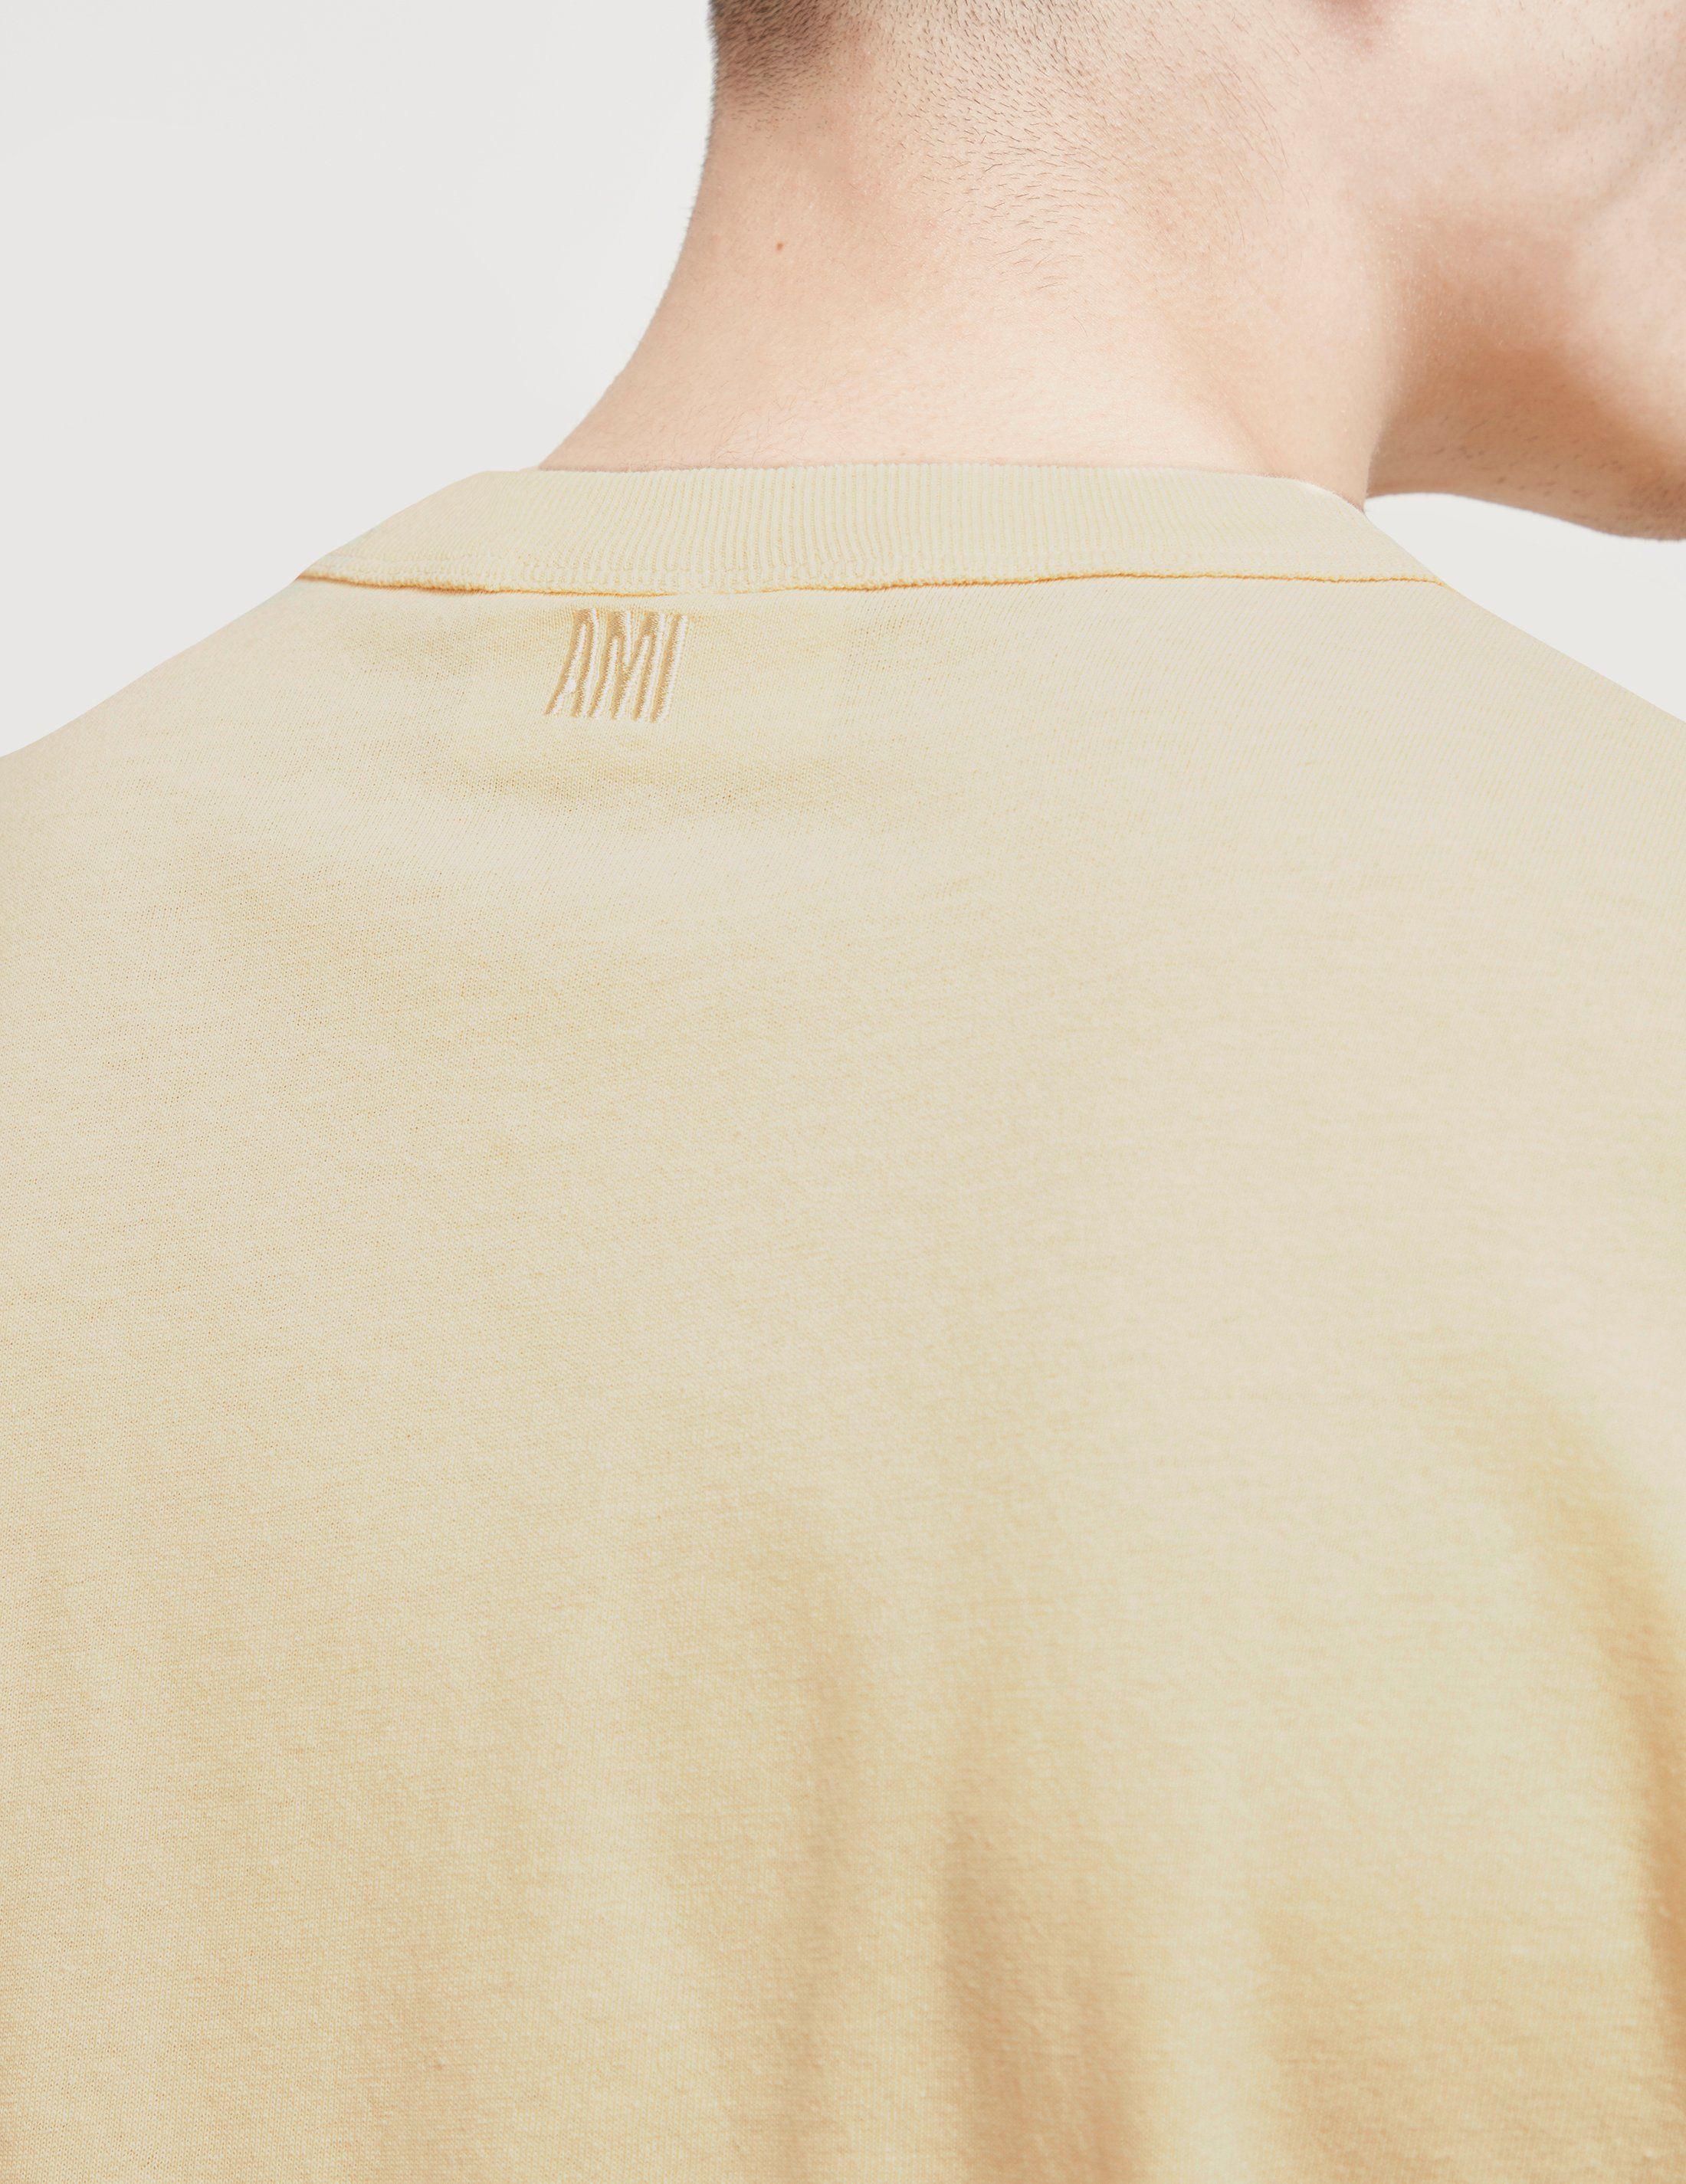 AMI Paris Heart Short Sleeve T-Shirt